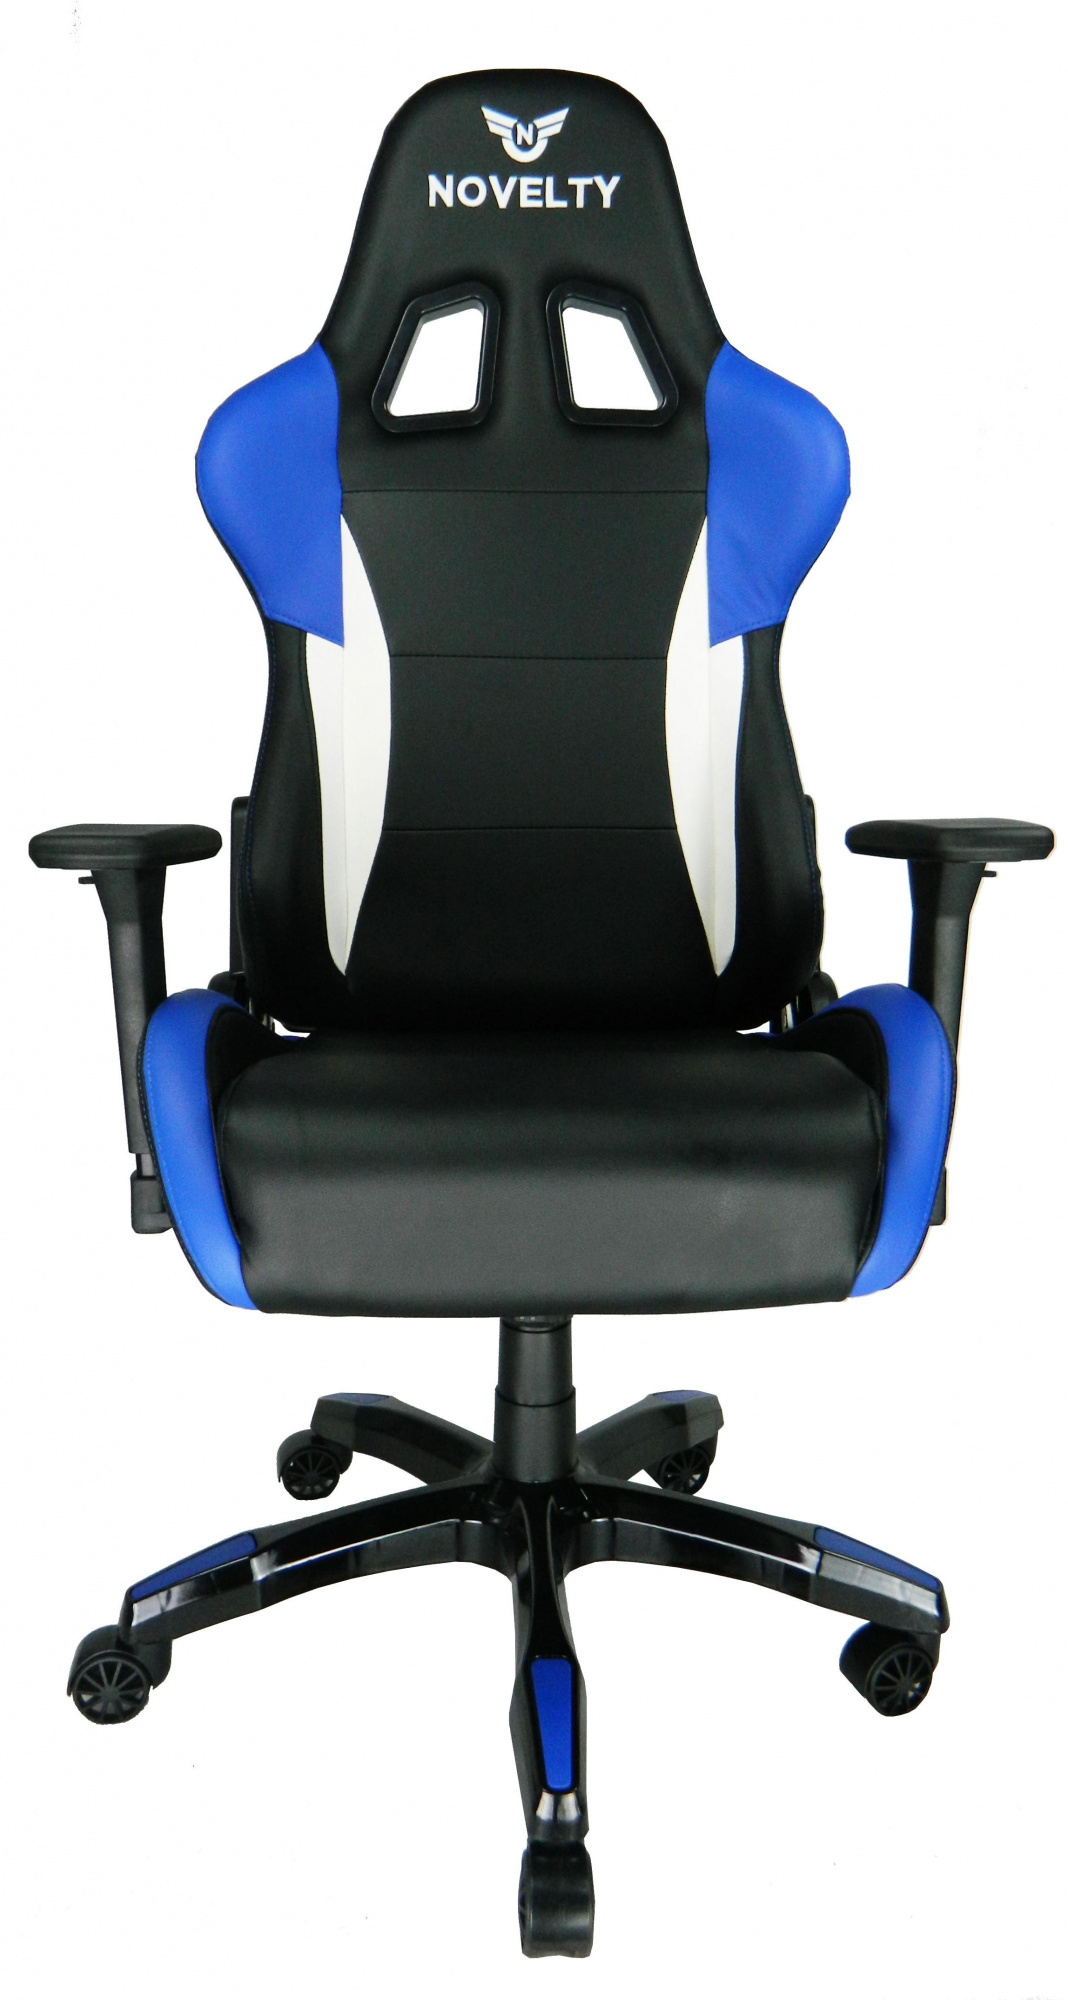 Novelty RGC-8087 - компьютерное игровое кресло (Black/White/Blue) cougar armor black orange игровое кресло